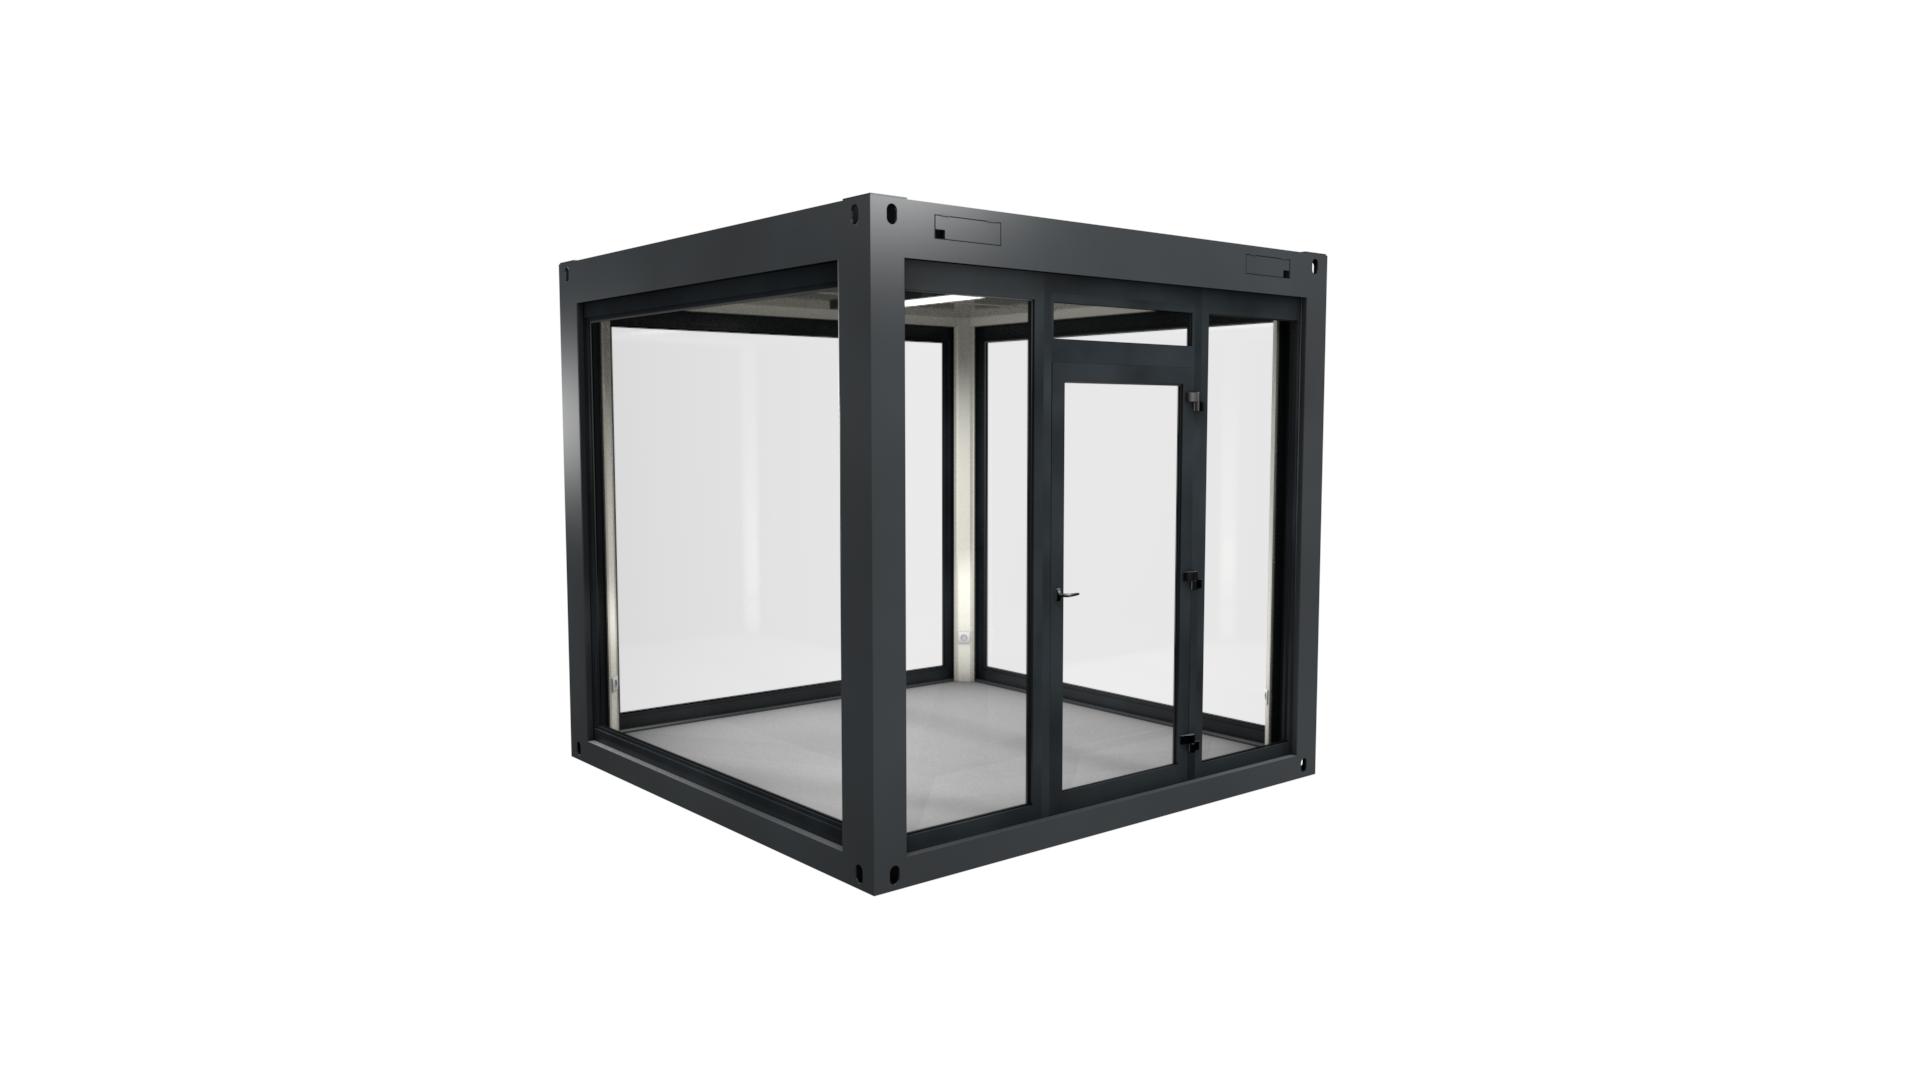 Cube 2 - Ansicht 1